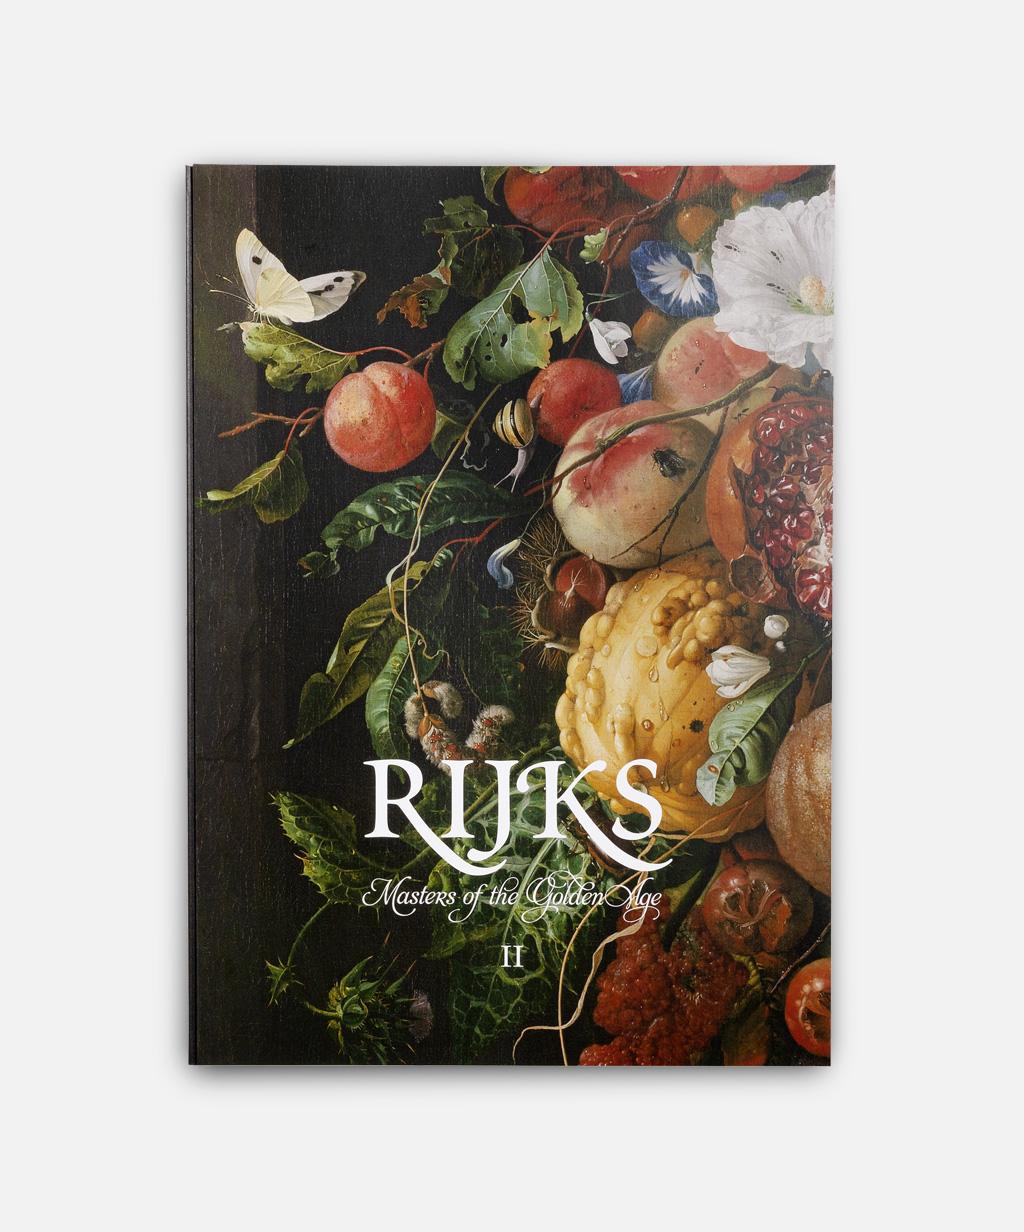 MW_Rijks_special_edition_1024_03